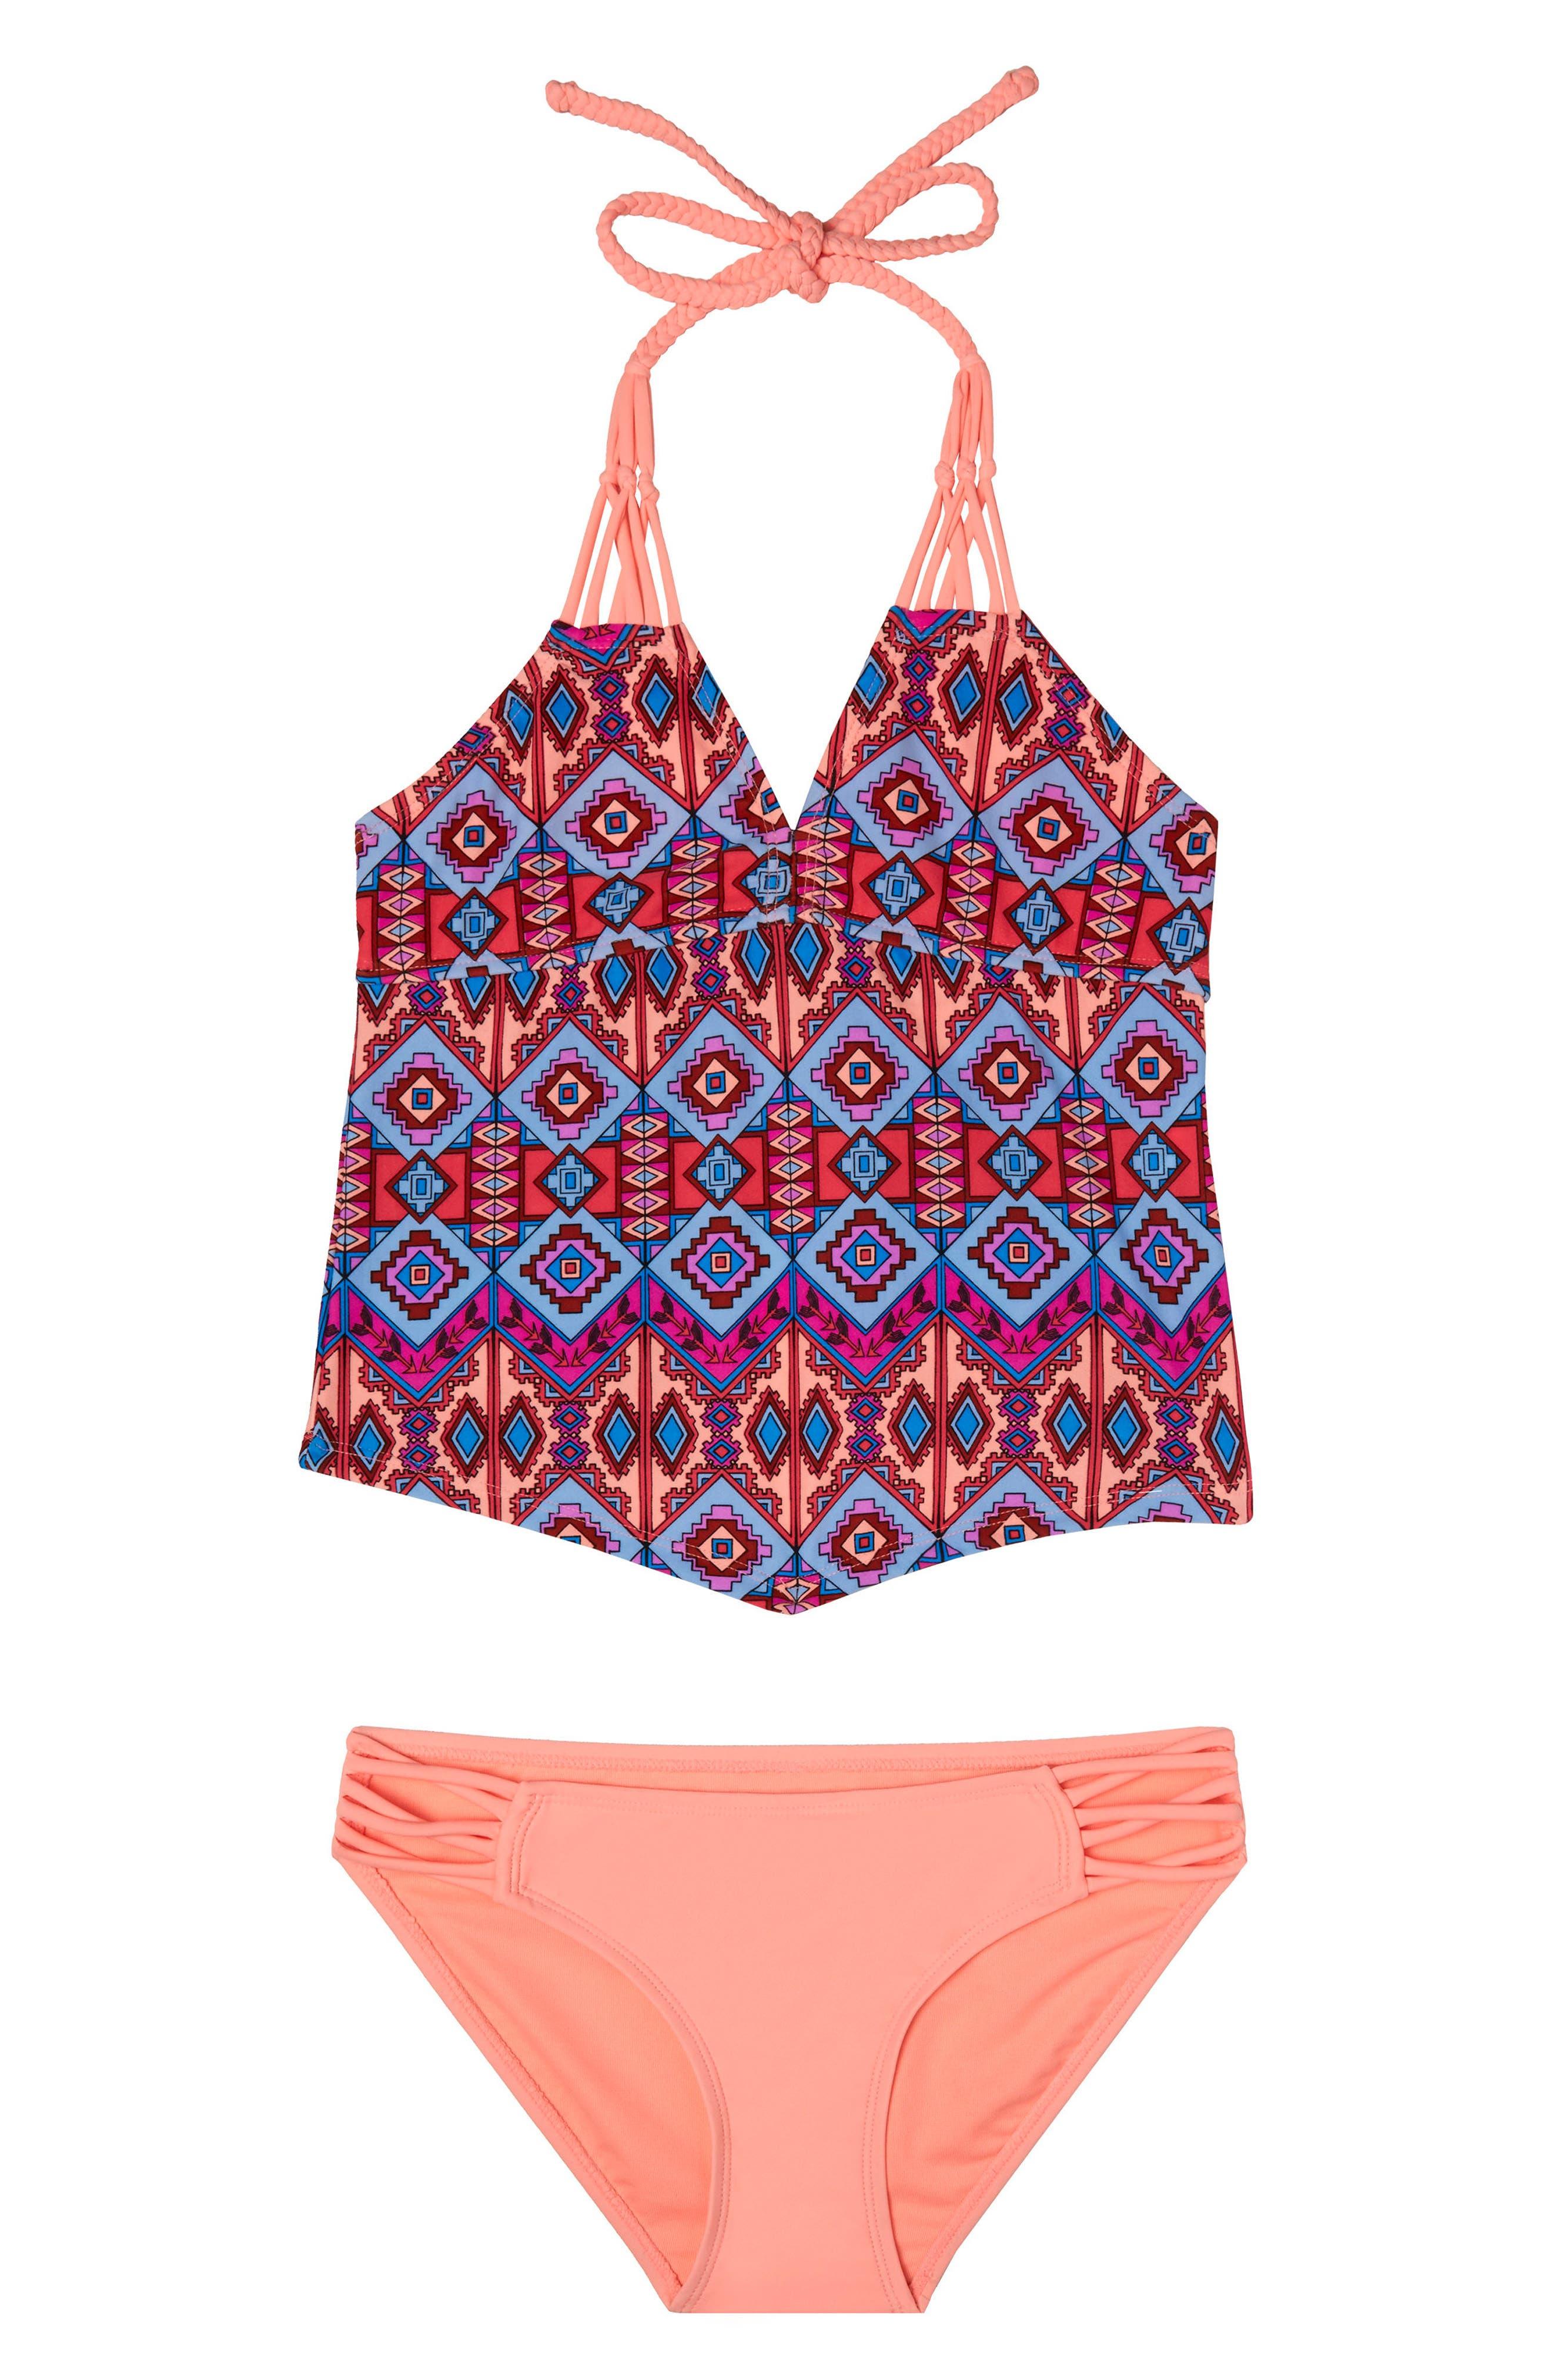 Brave Spirit Two-Piece Swimsuit,                         Main,                         color, 958